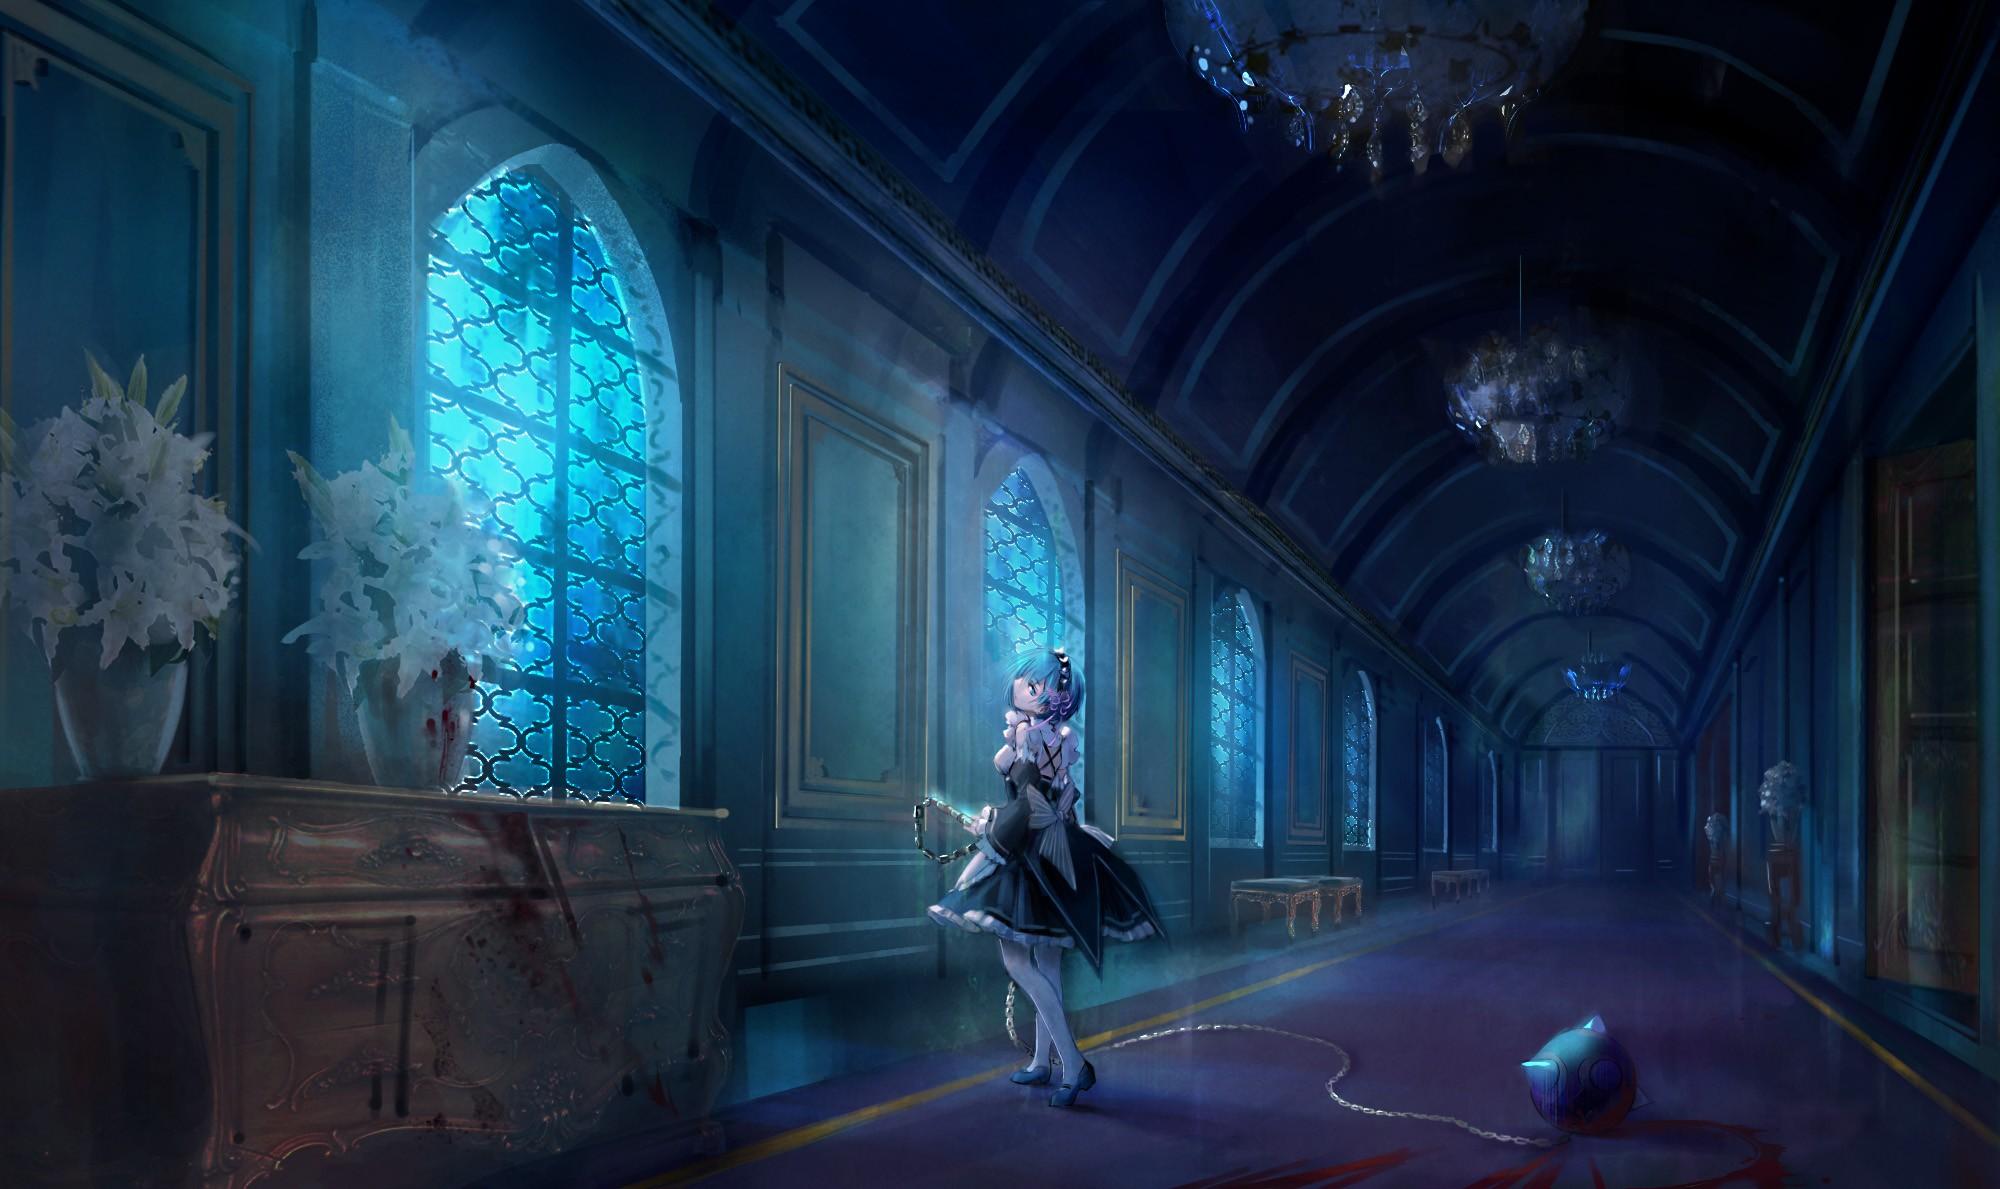 Rem Re Zero wallpaper ·① Download free cool HD backgrounds ...